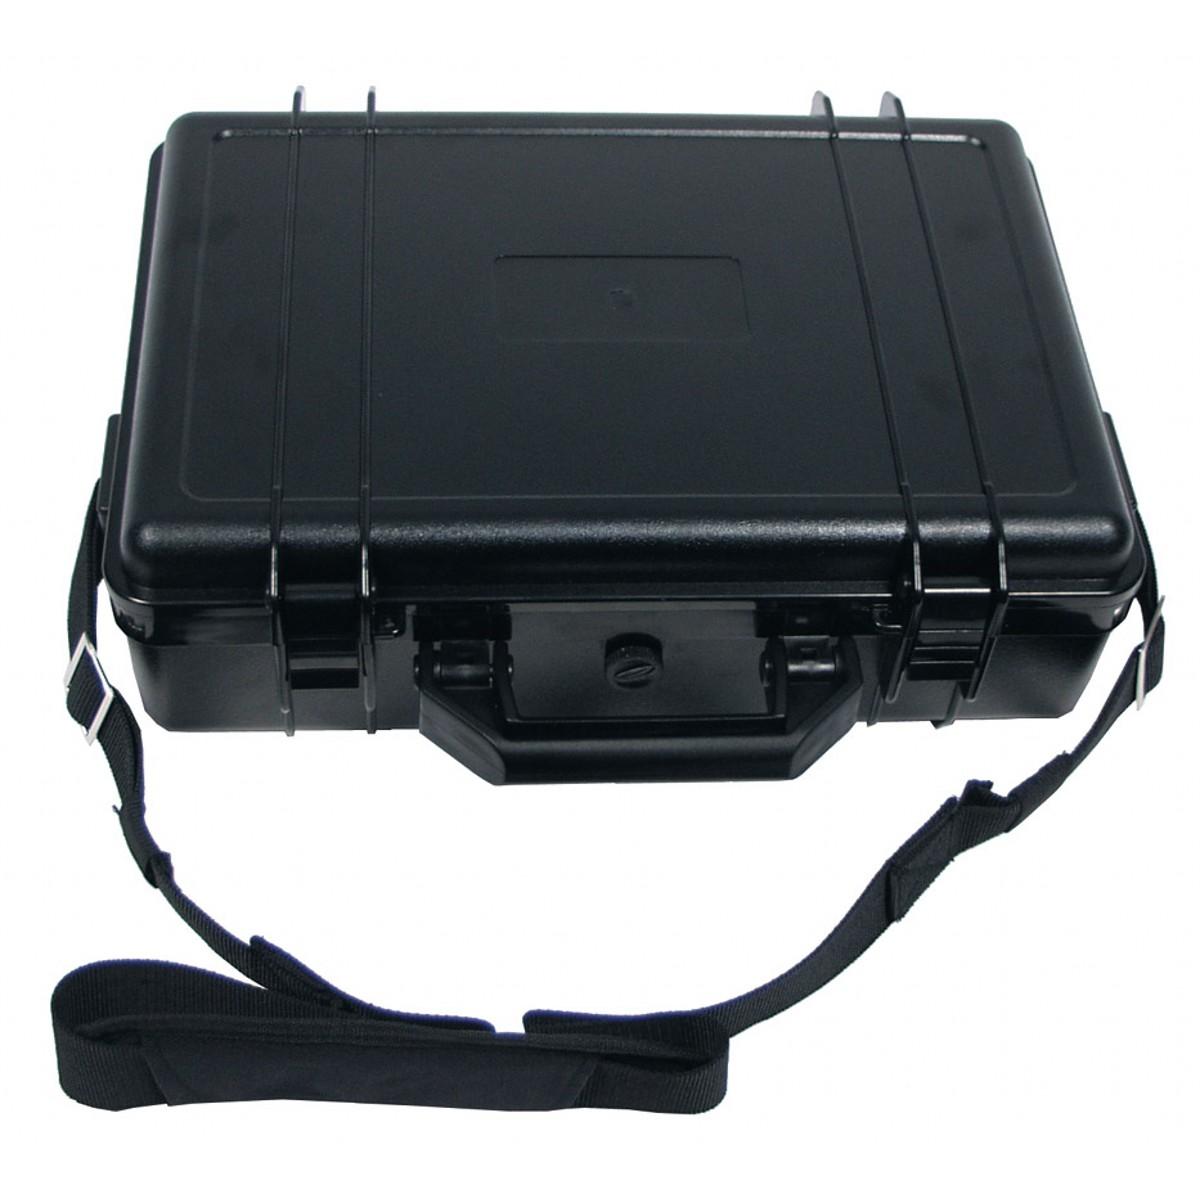 Kufr plastový vodotěsný Maxi - černý